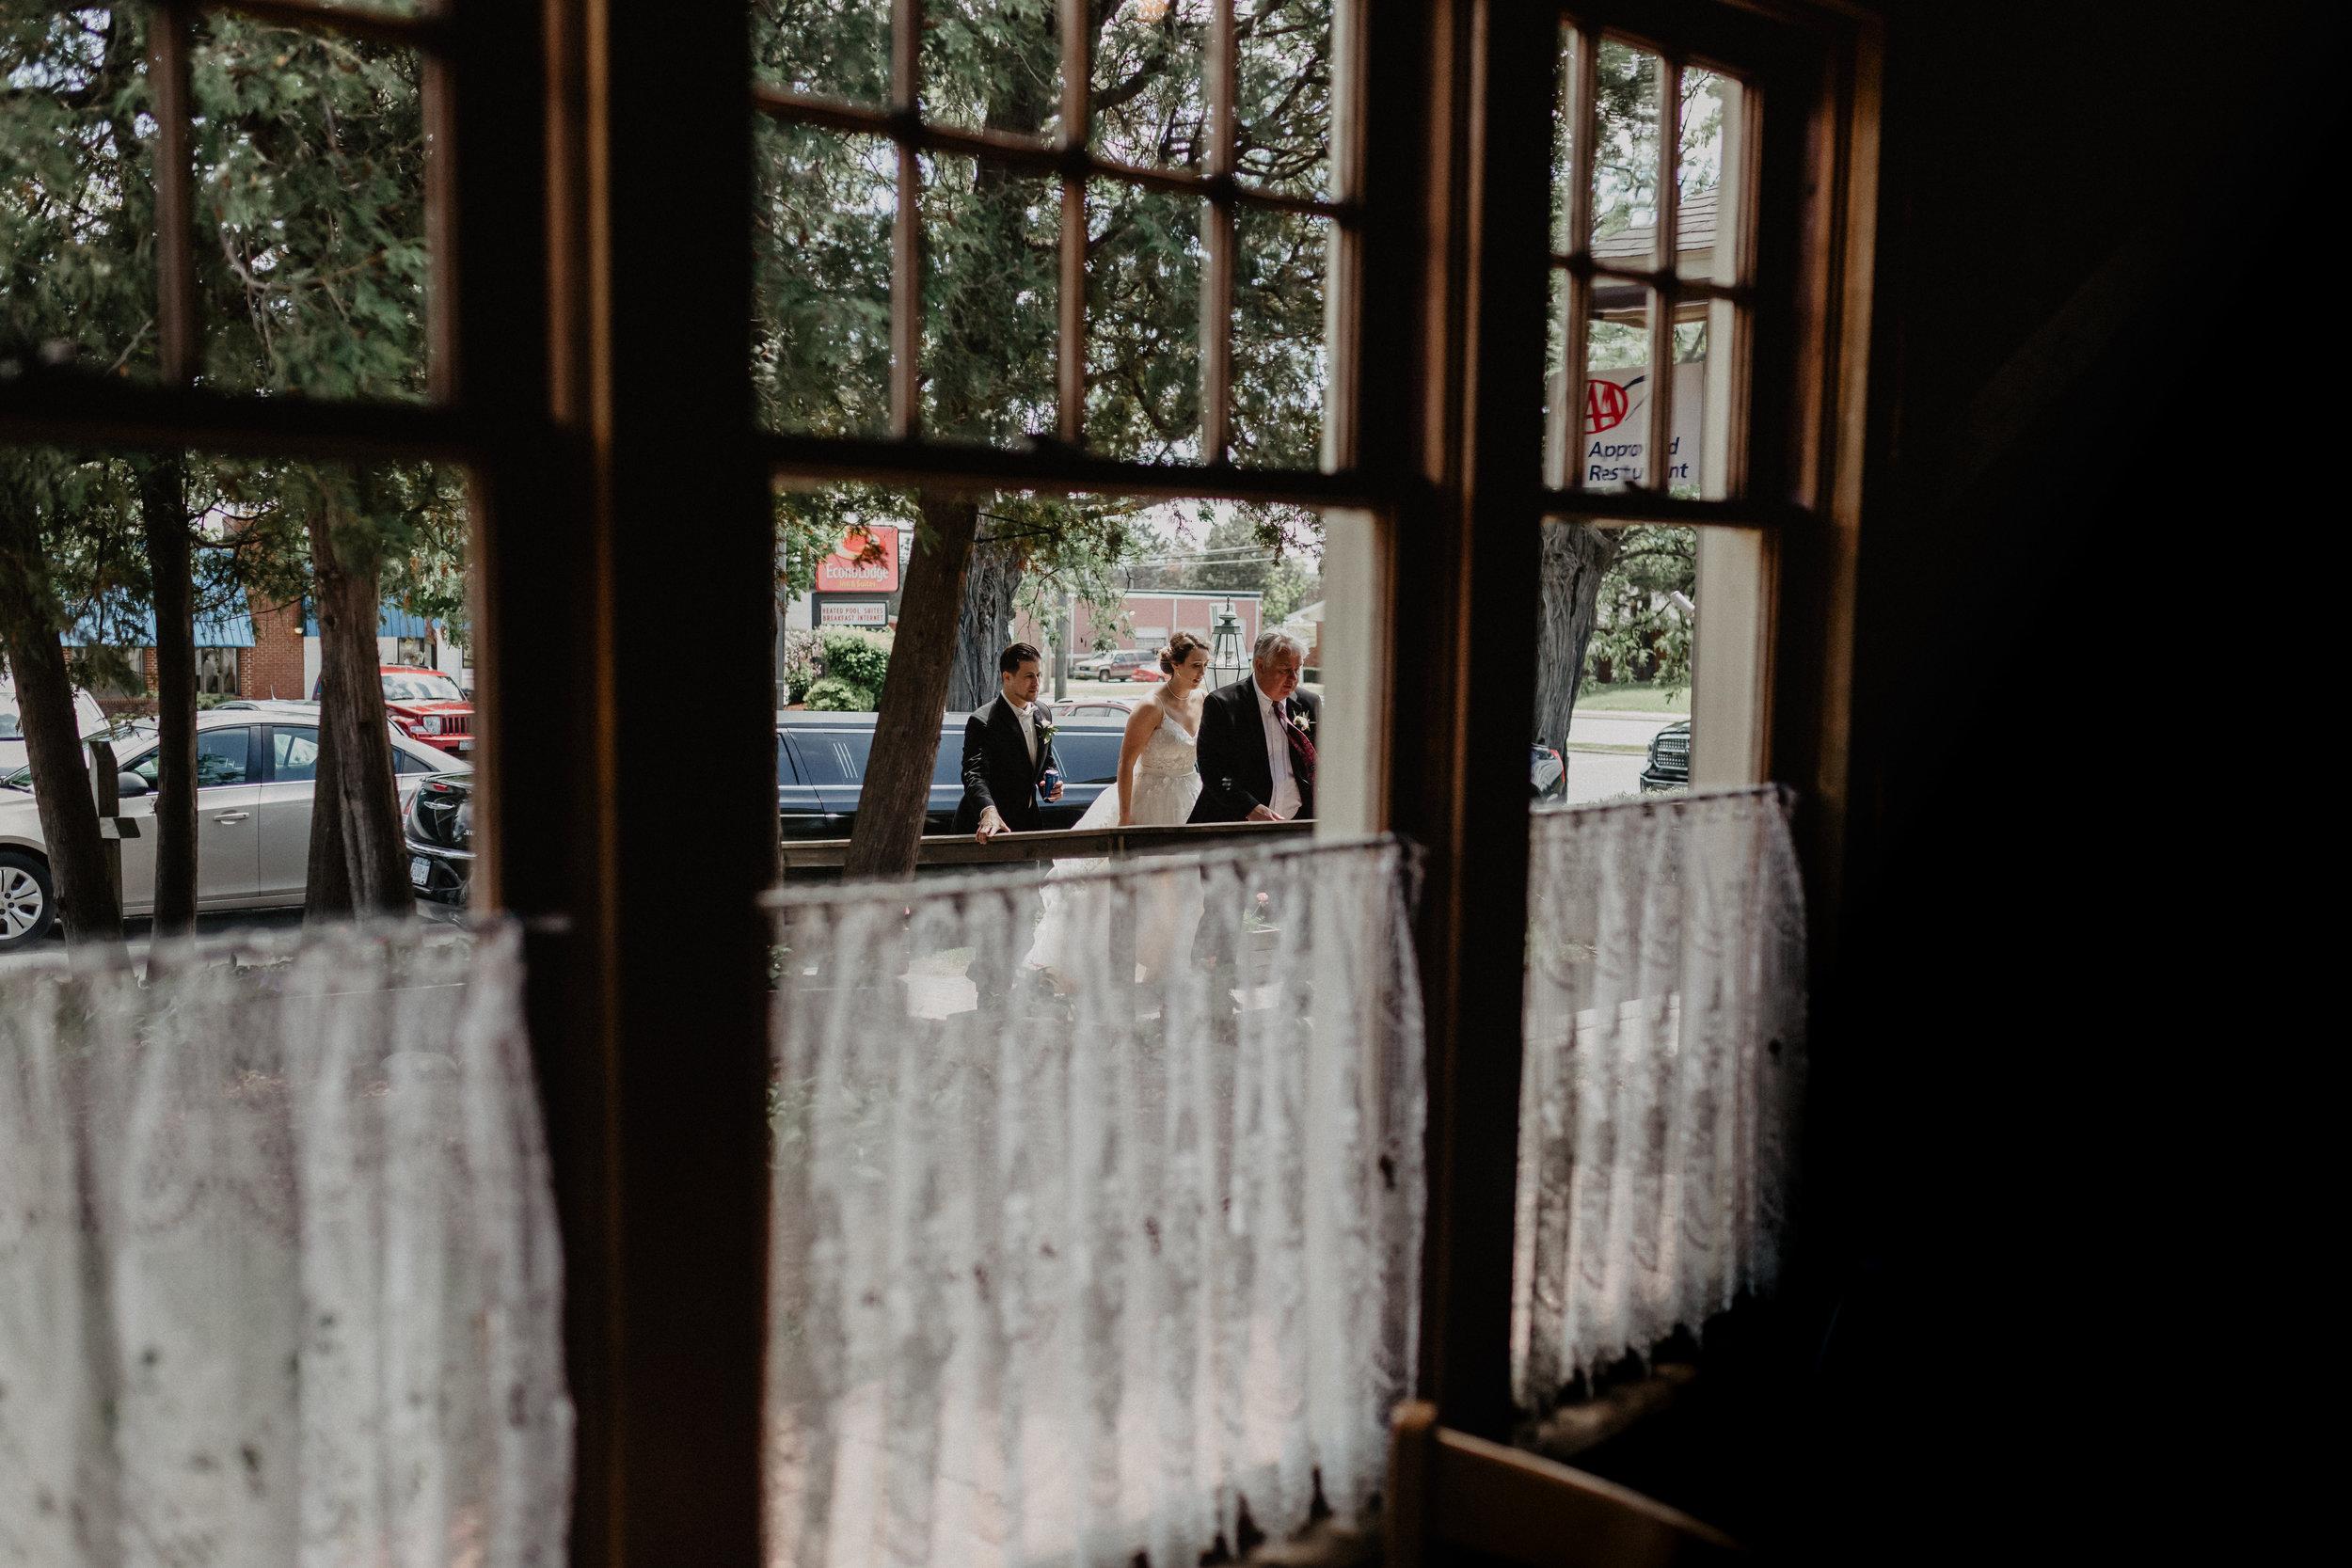 upstate_ny_wedding-40.jpg